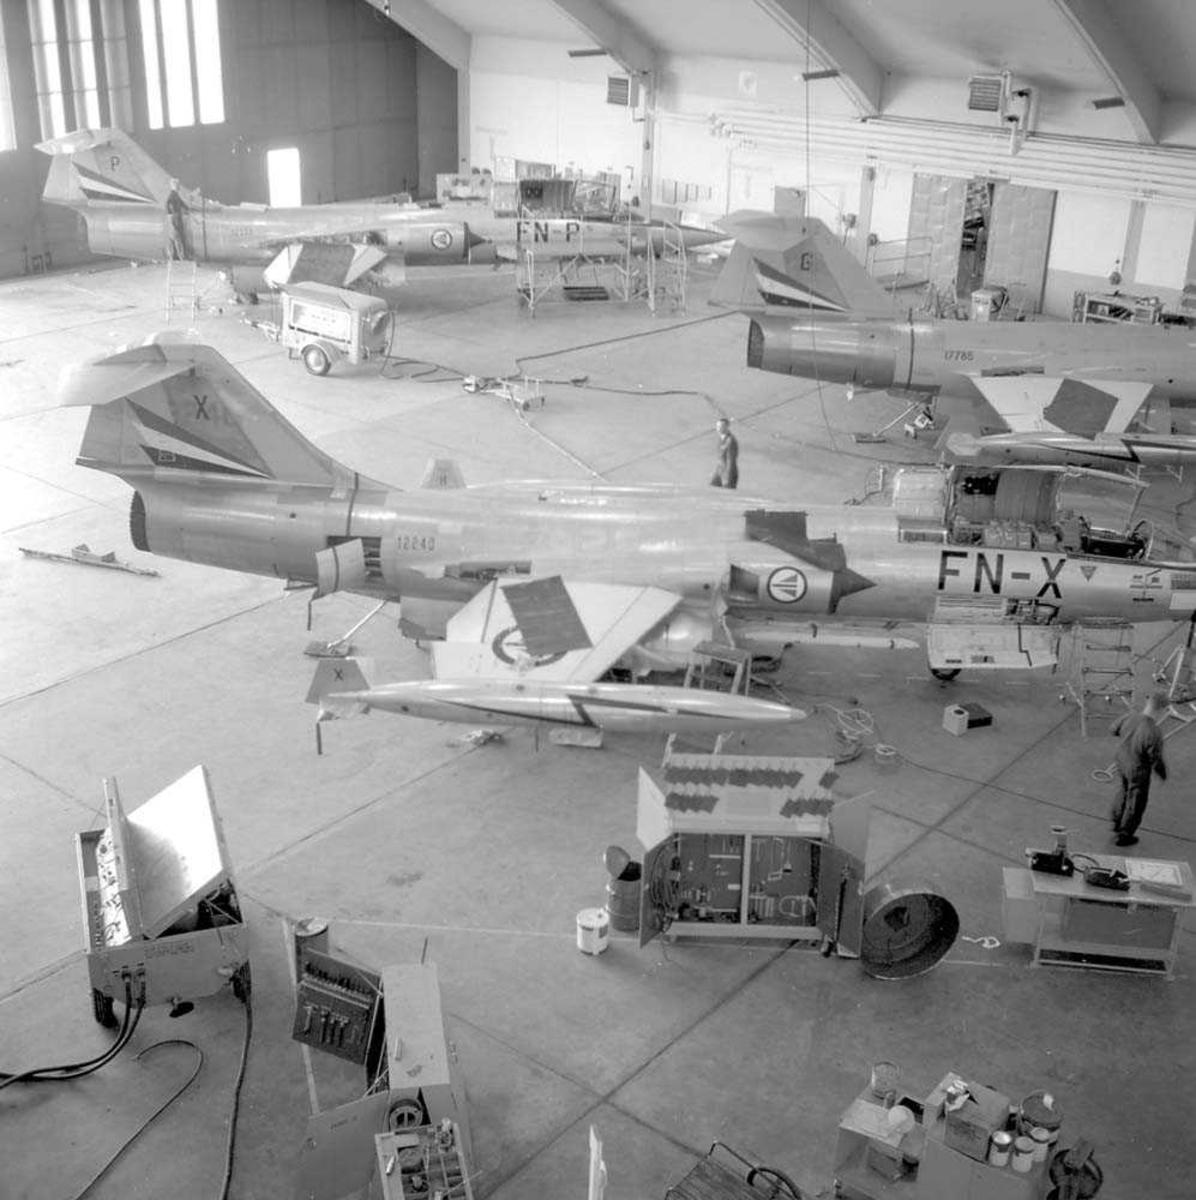 Hangar A, Bodø flystasjon.